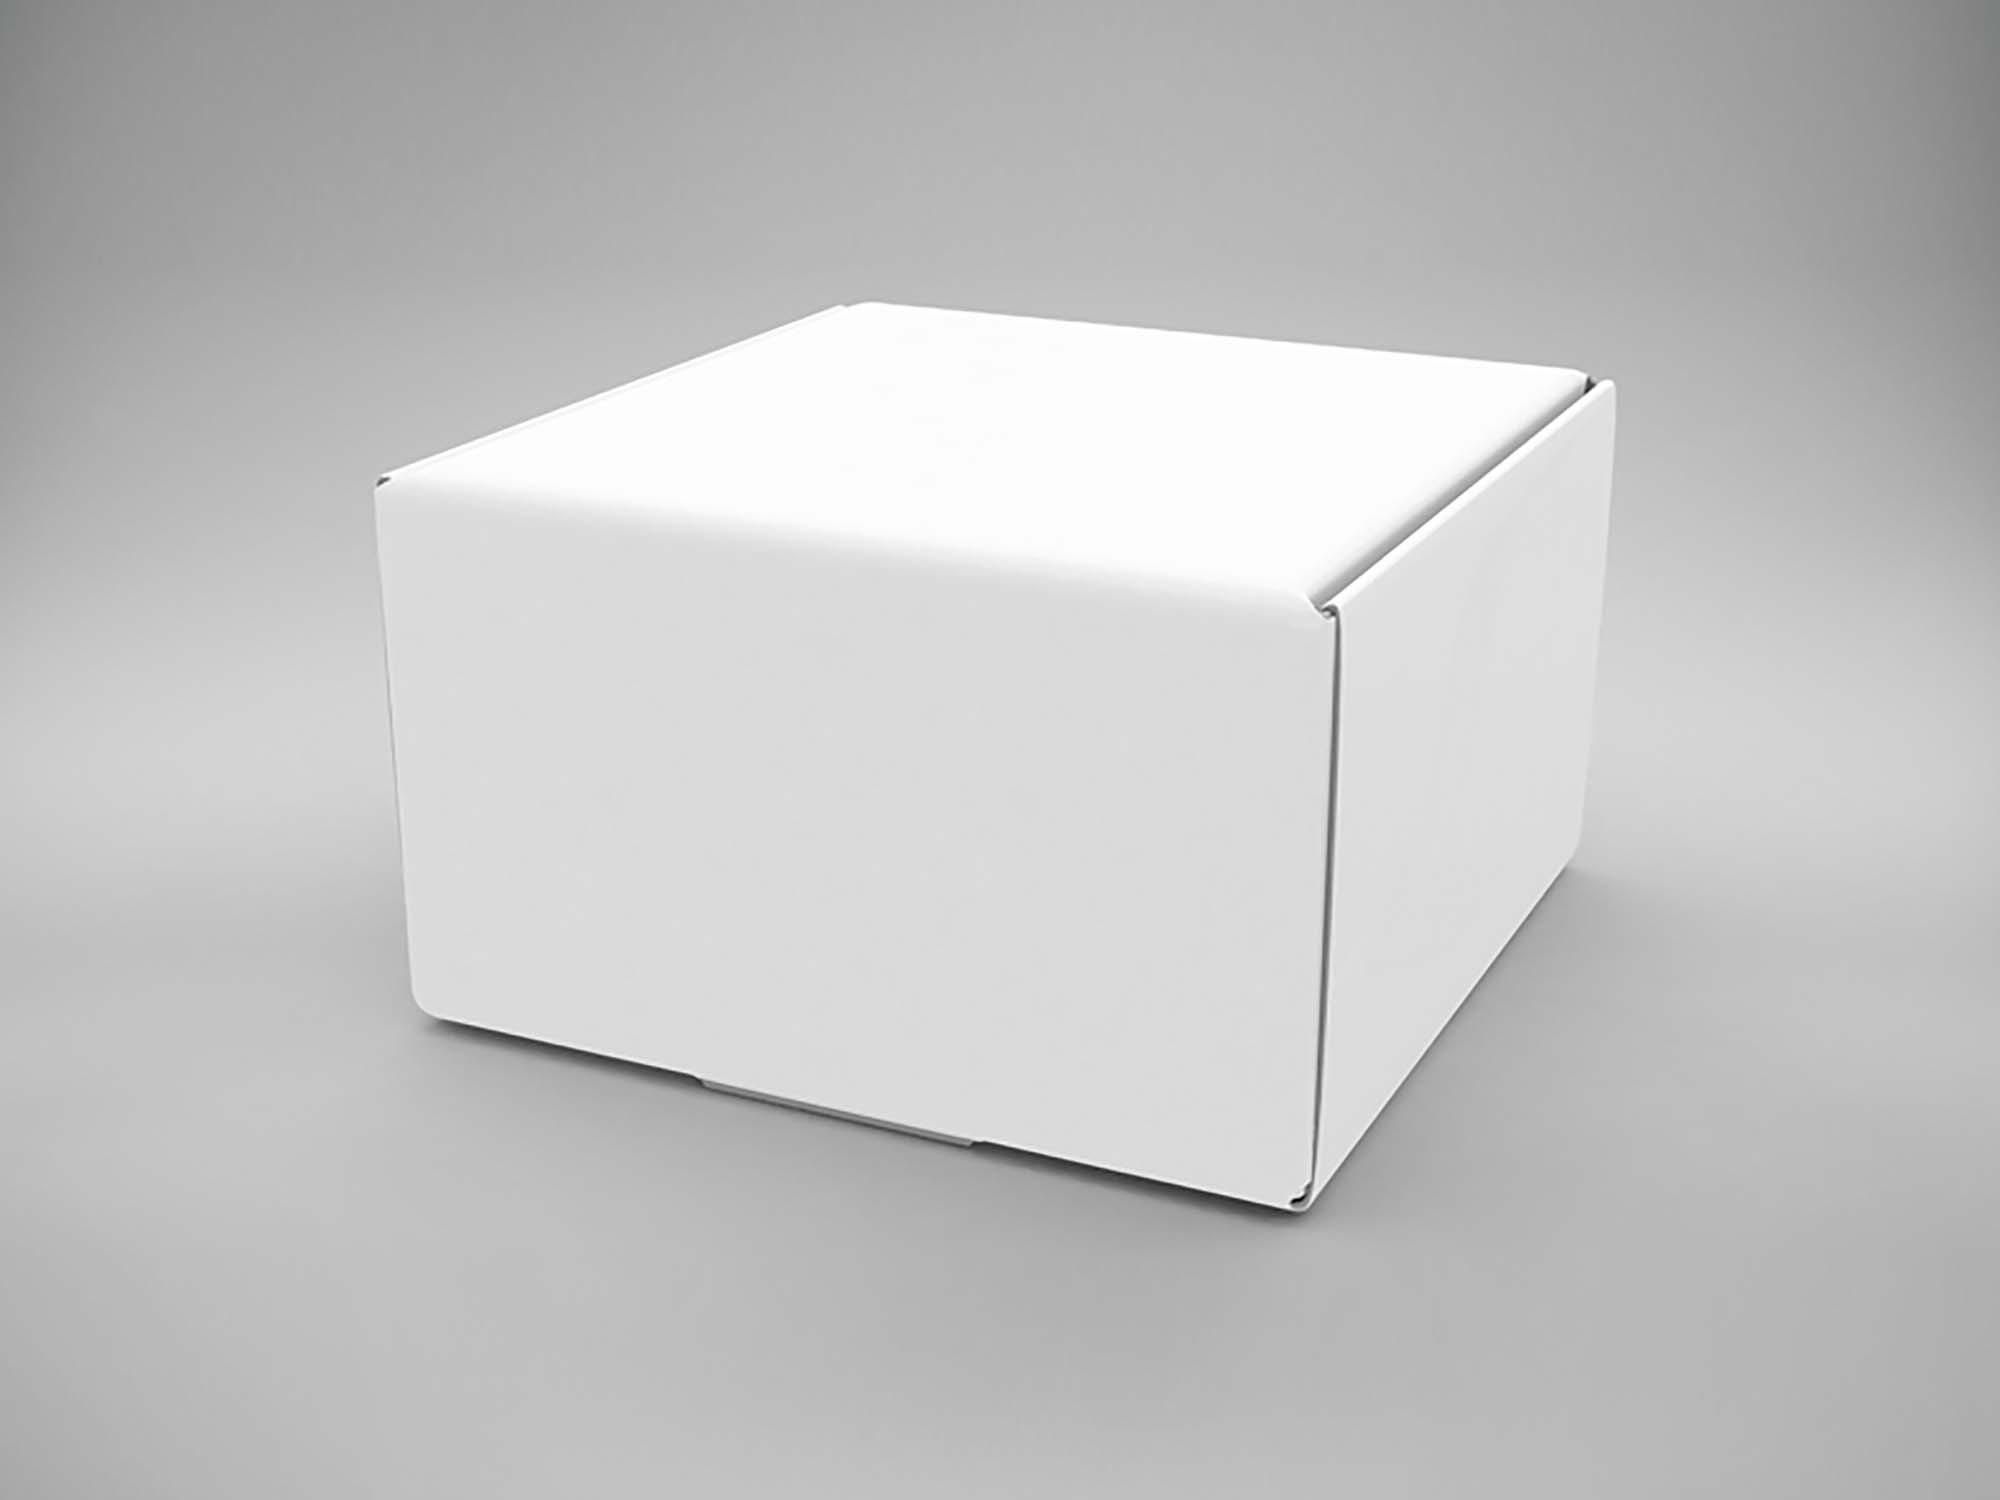 Square Box Mockup PSD